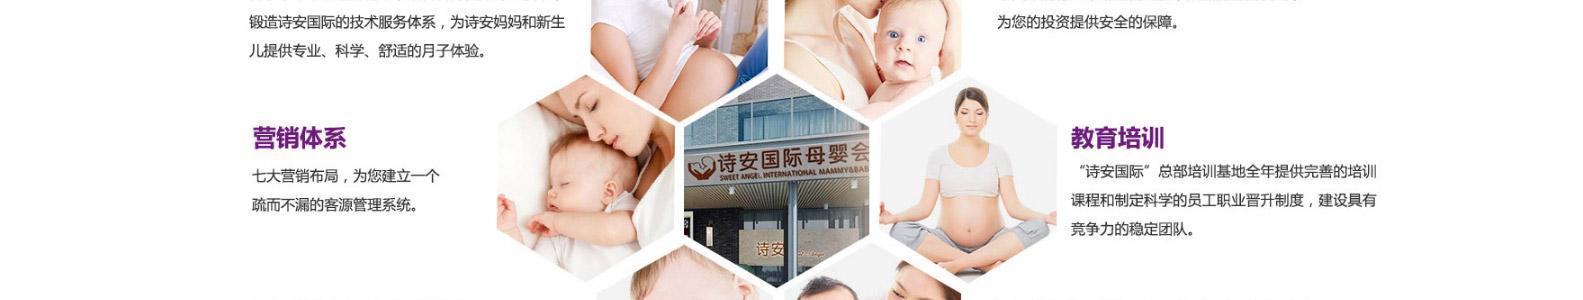 诗安国际母婴会所诗安国际母婴会所_15